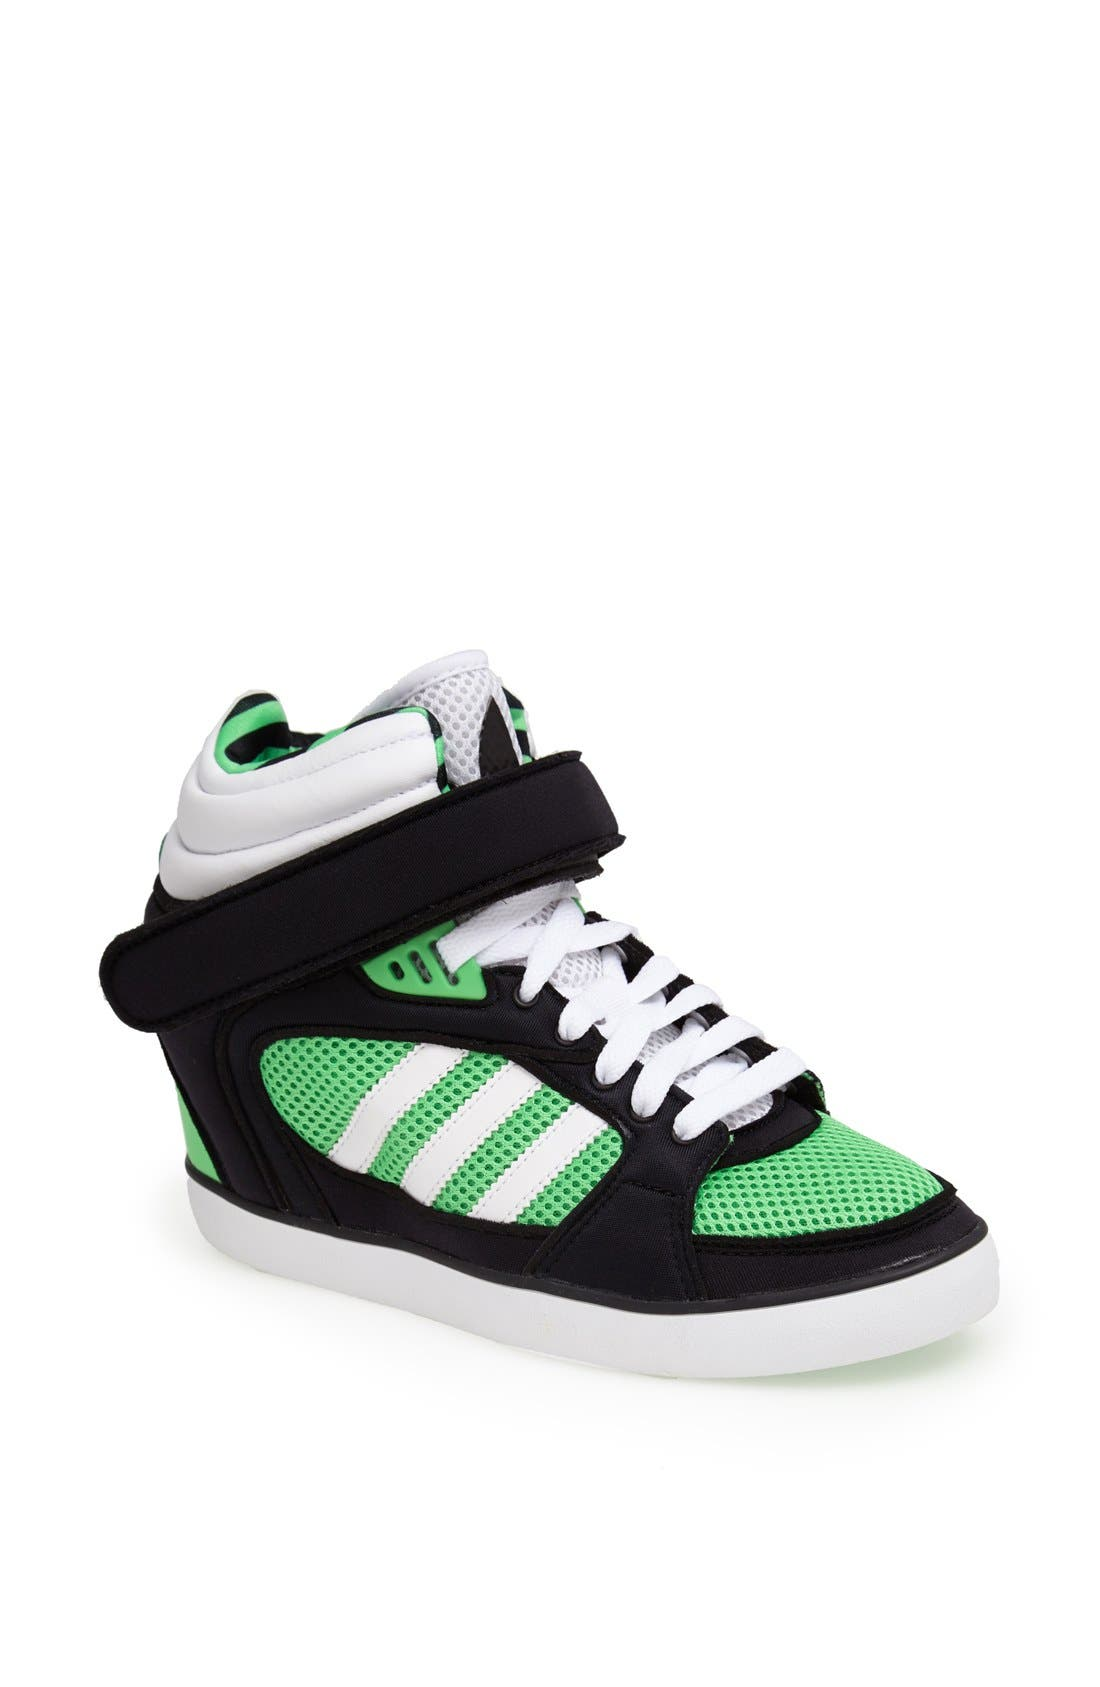 Alternate Image 1 Selected - adidas 'Amerlight' Wedge Sneaker (Women)